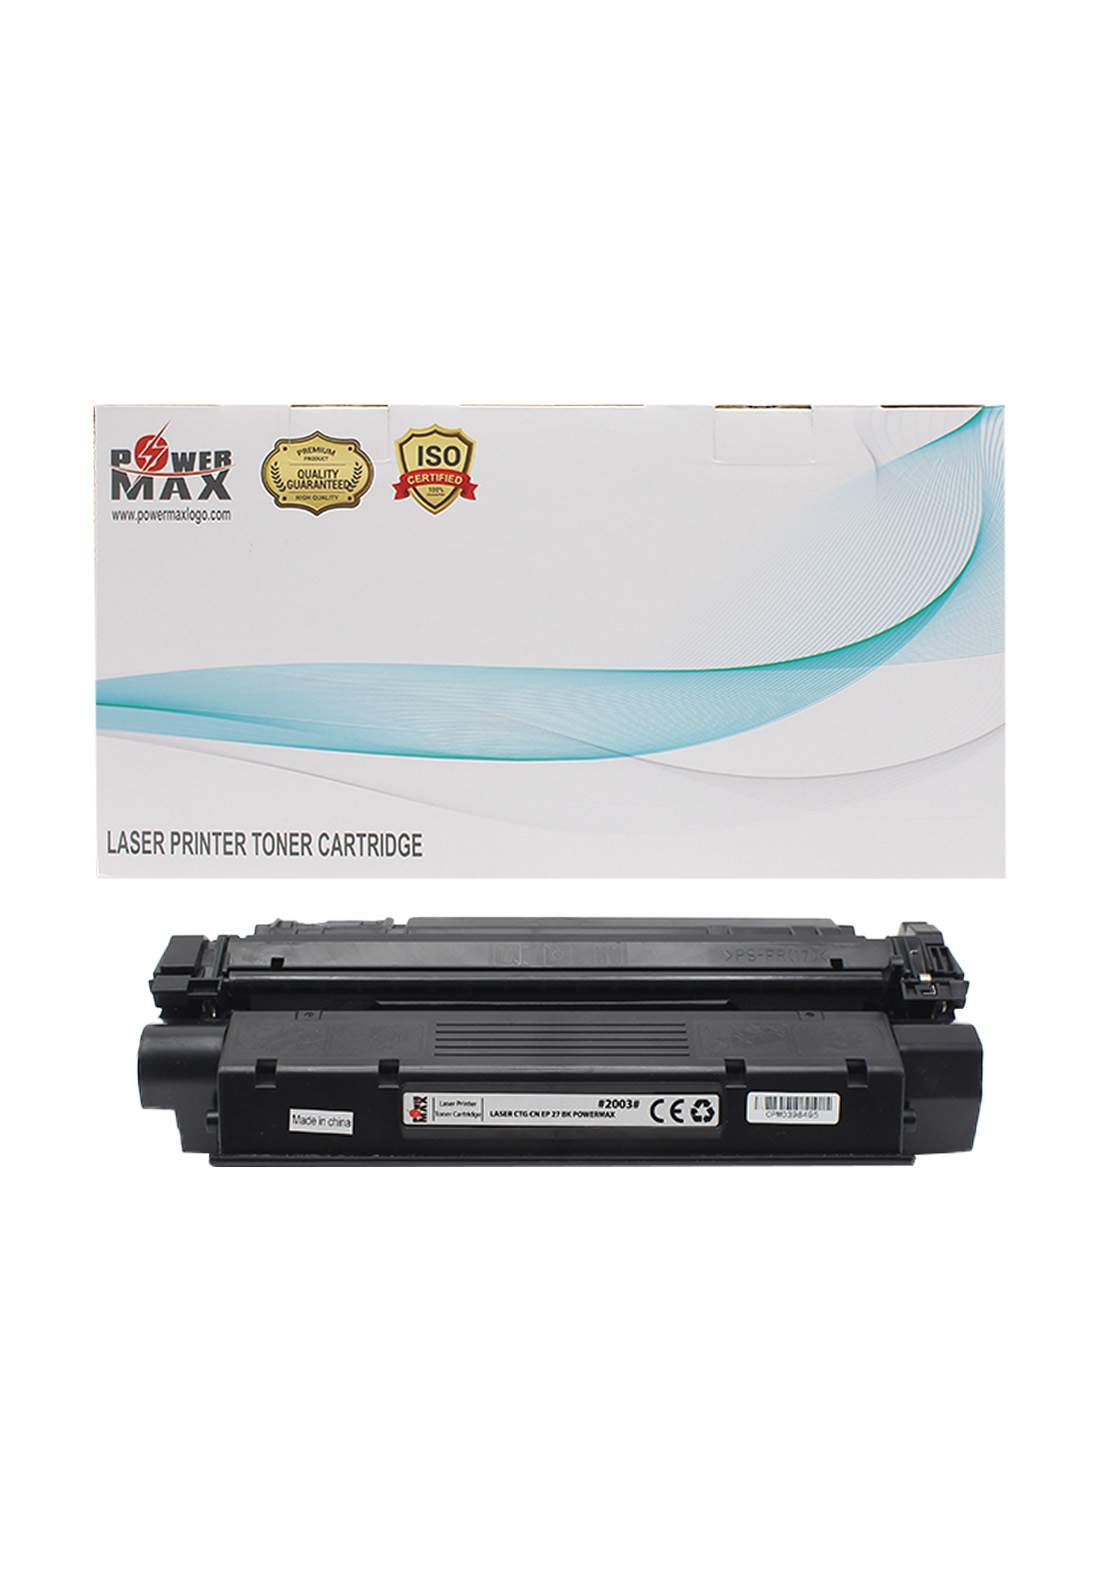 Power Max CTG Canon EP 27 Laser Printer Toner Cartridge خرطوشة حبر